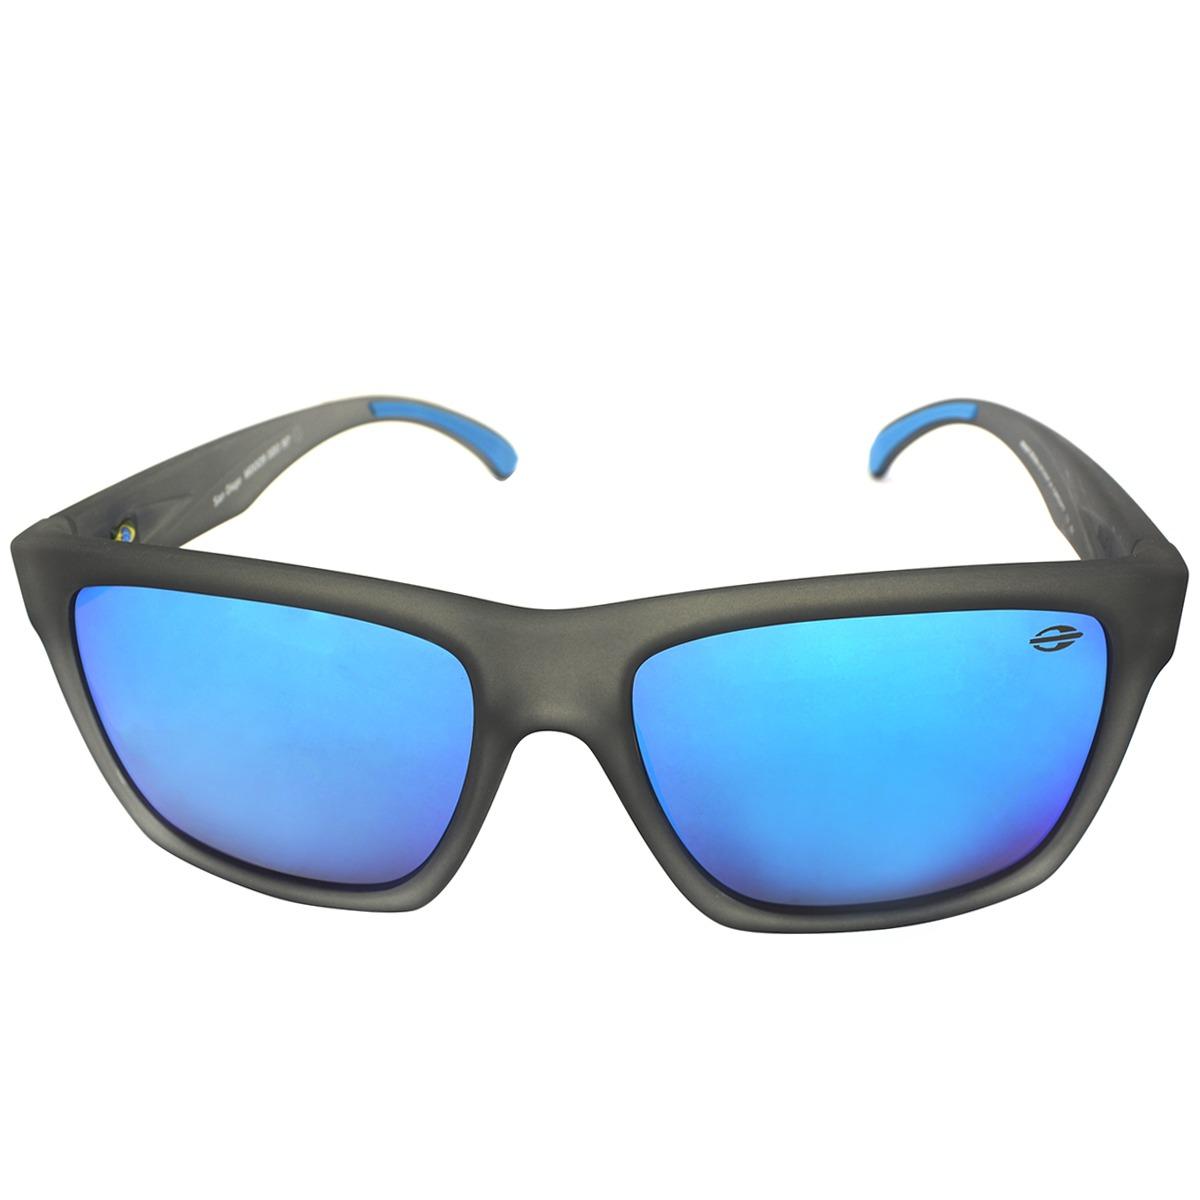 cecc35d6e óculos mormaii san diego cinza translucido/ lente revo azul. Carregando  zoom.